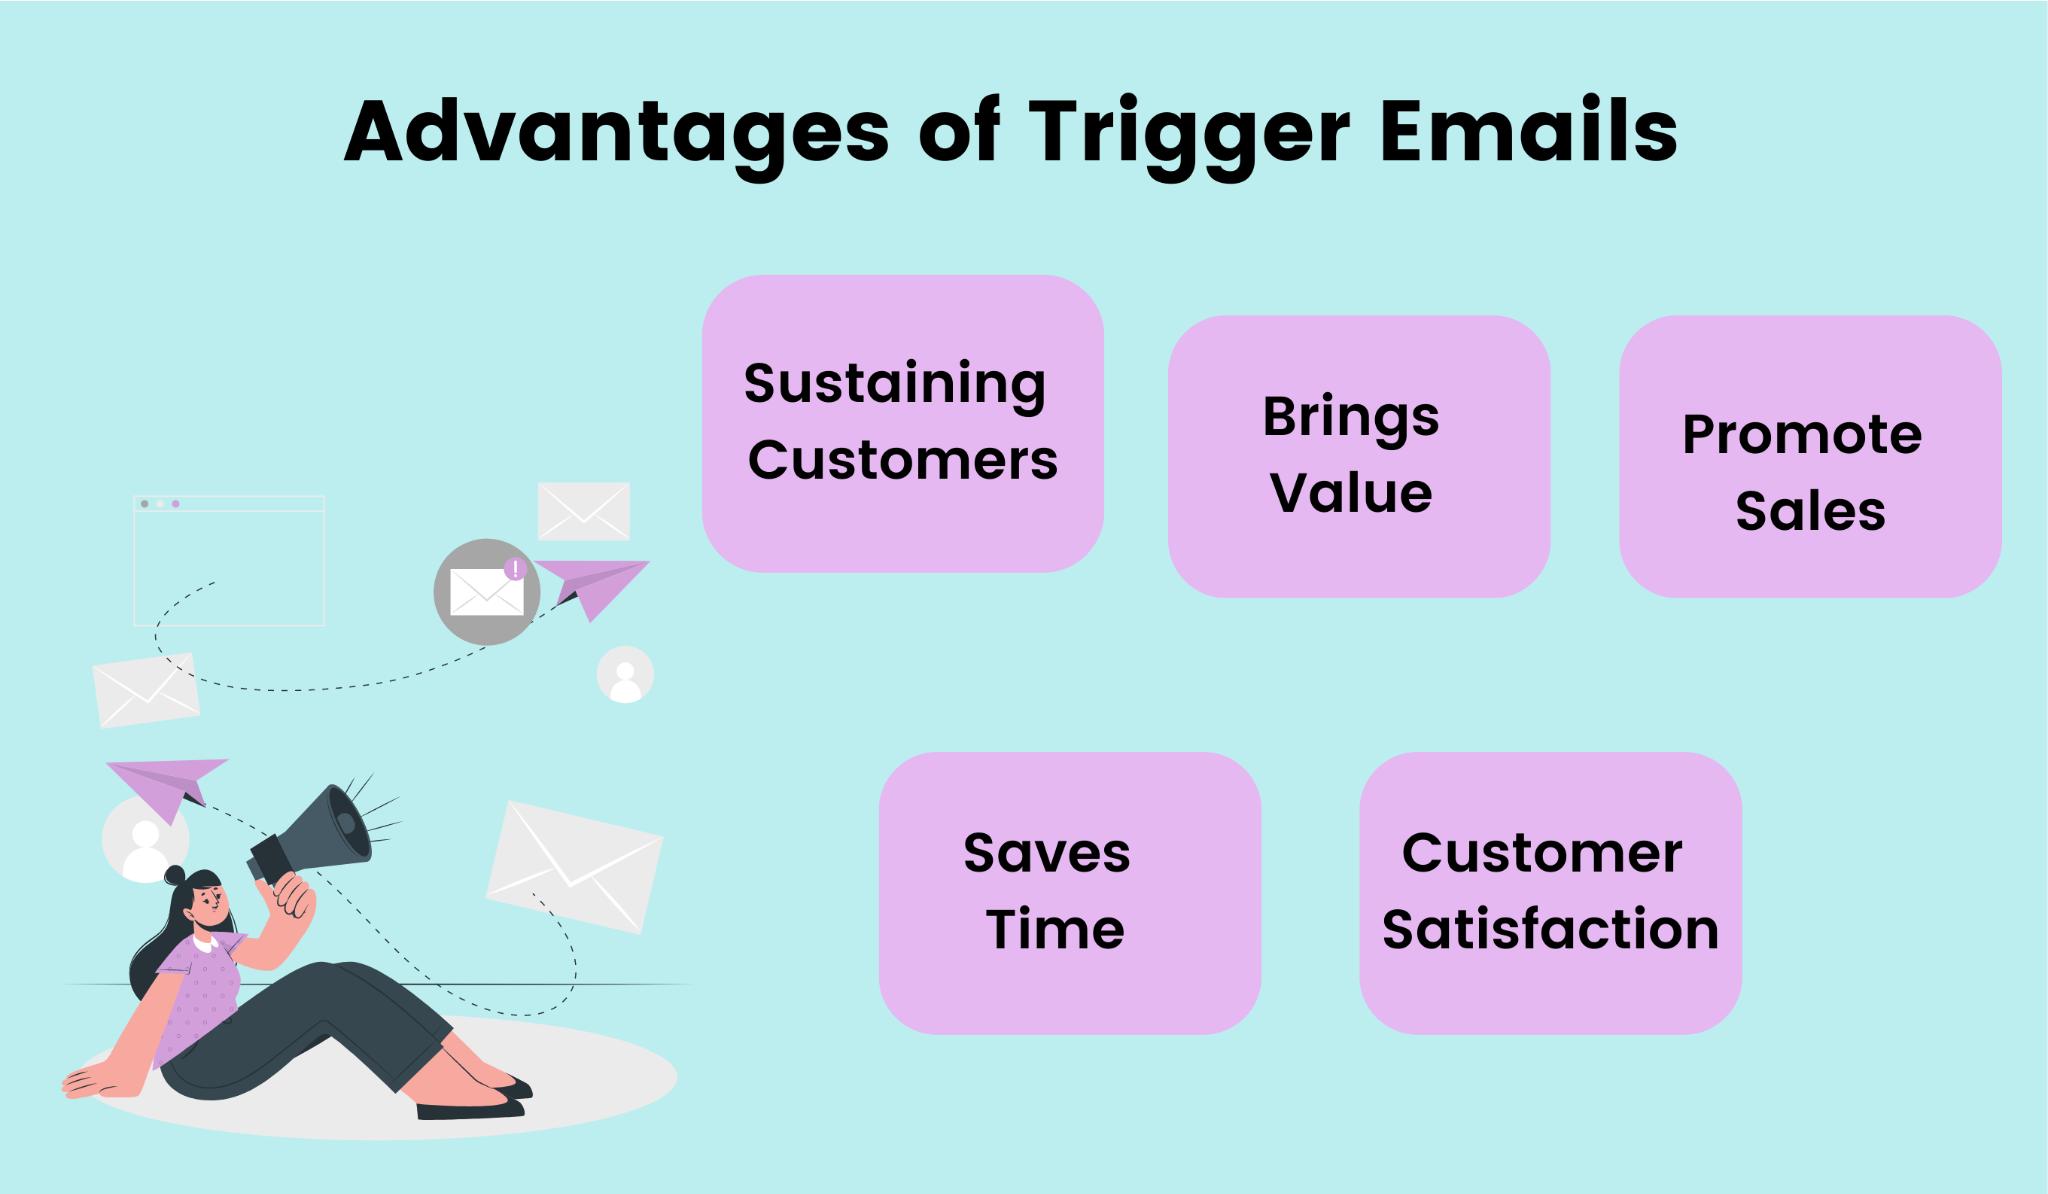 Different advantages of trigger emails.